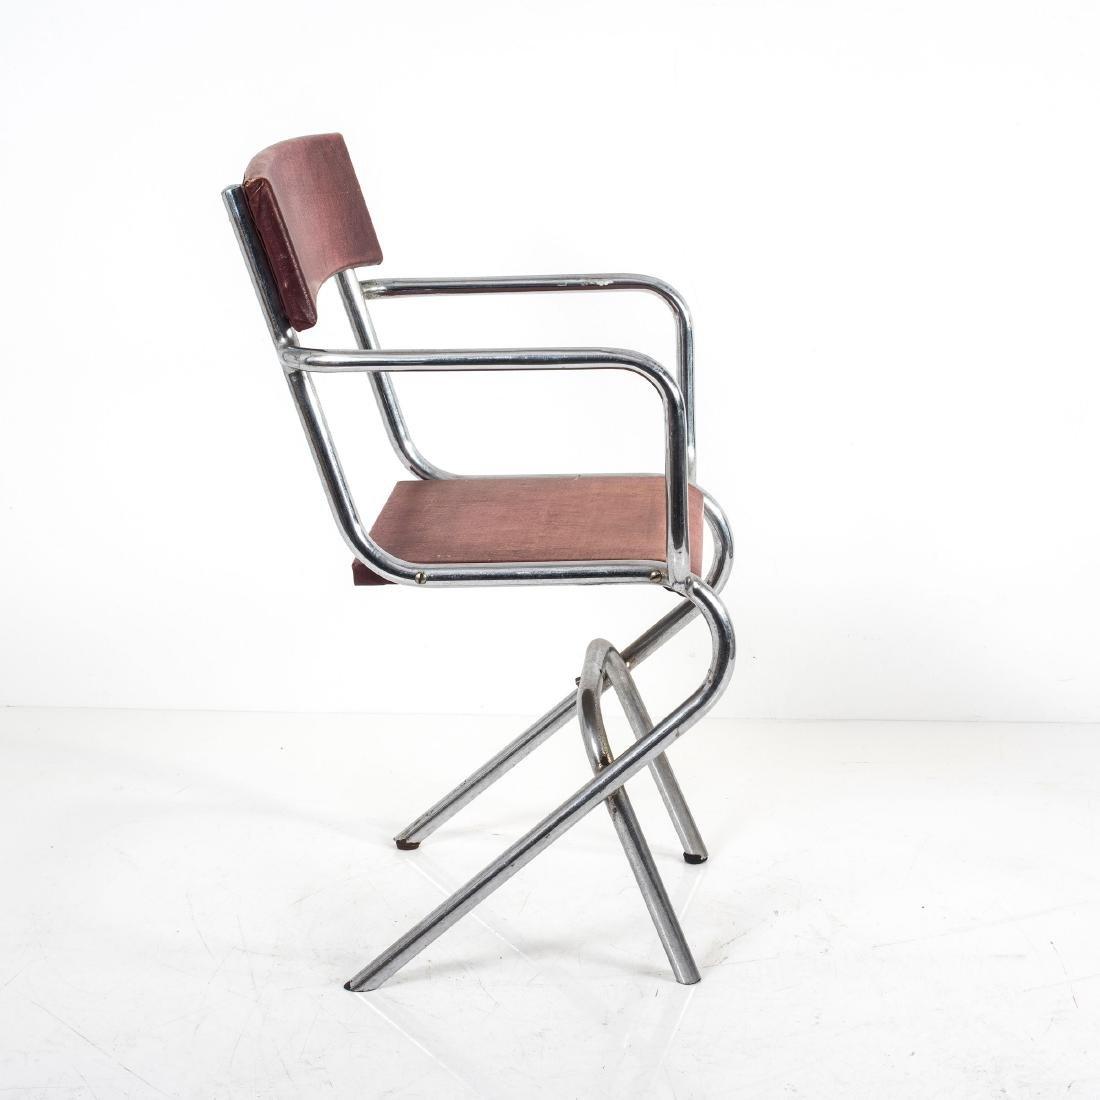 Tubular steel chair, 1939 - 4